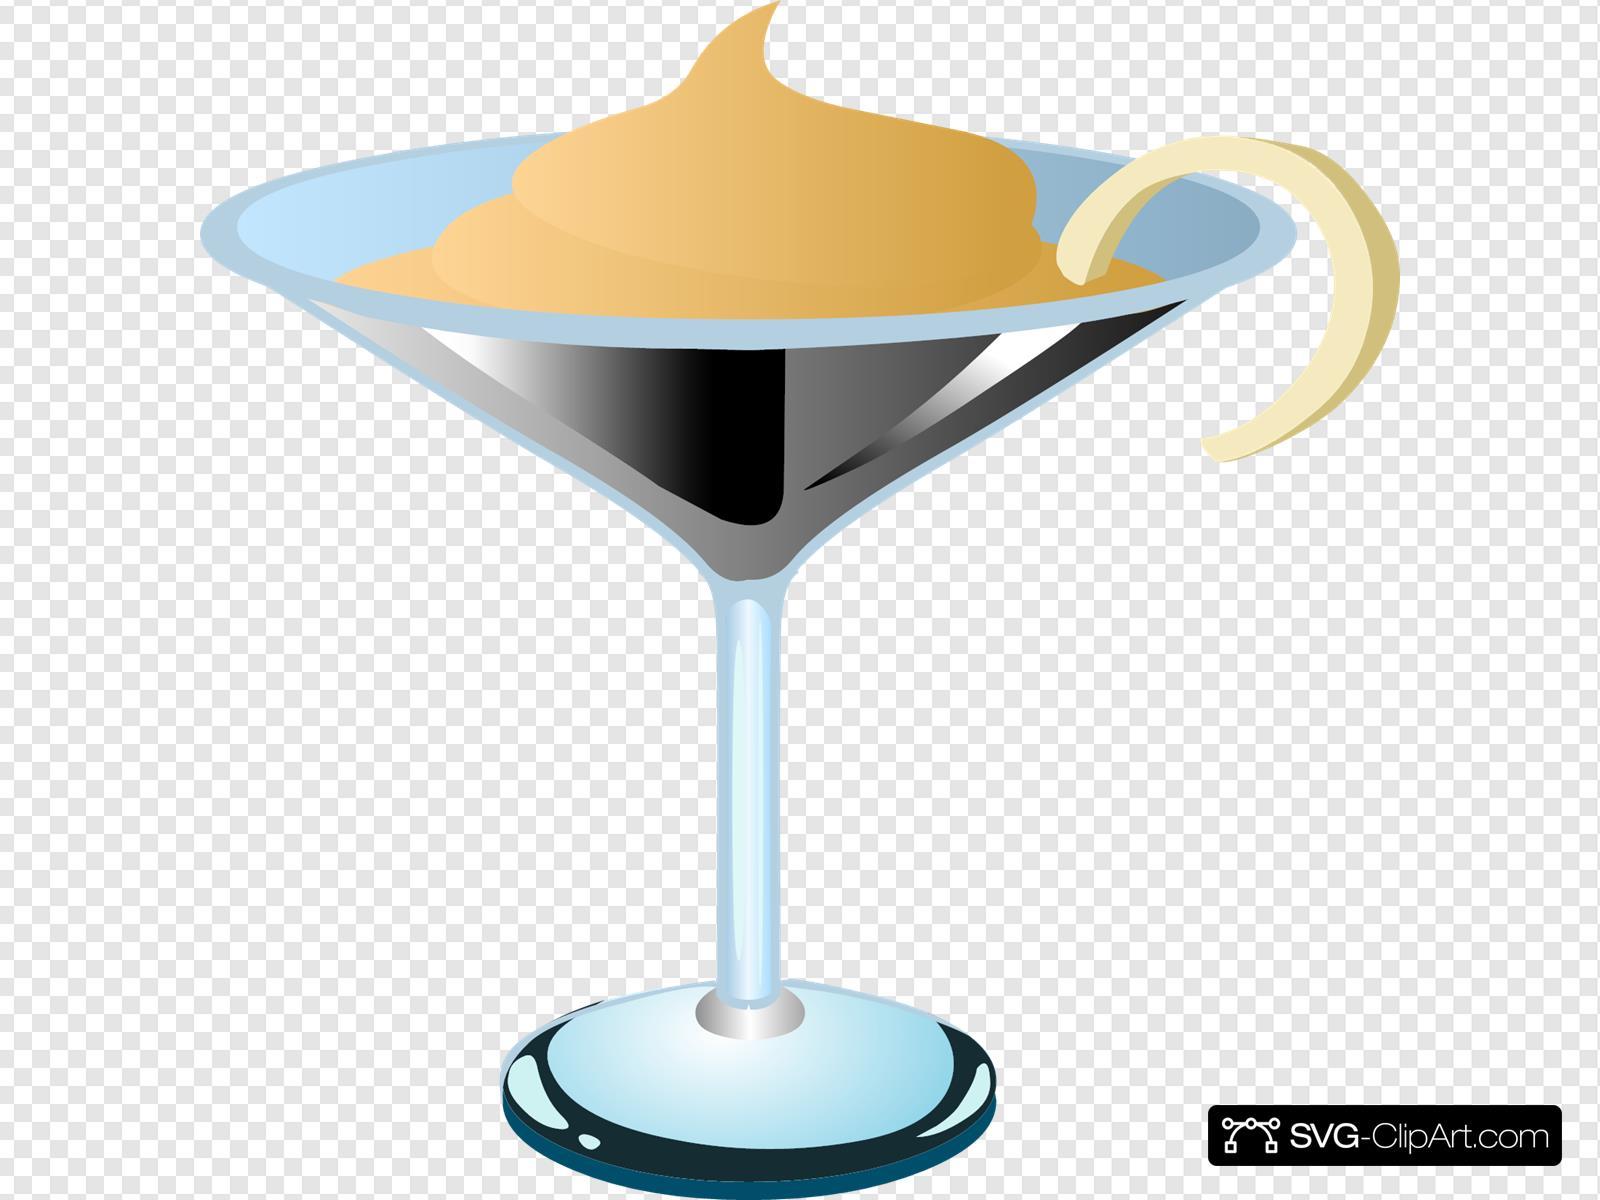 Beer Cartoon clipart - Cocktail, Beer, Martini, transparent clip art